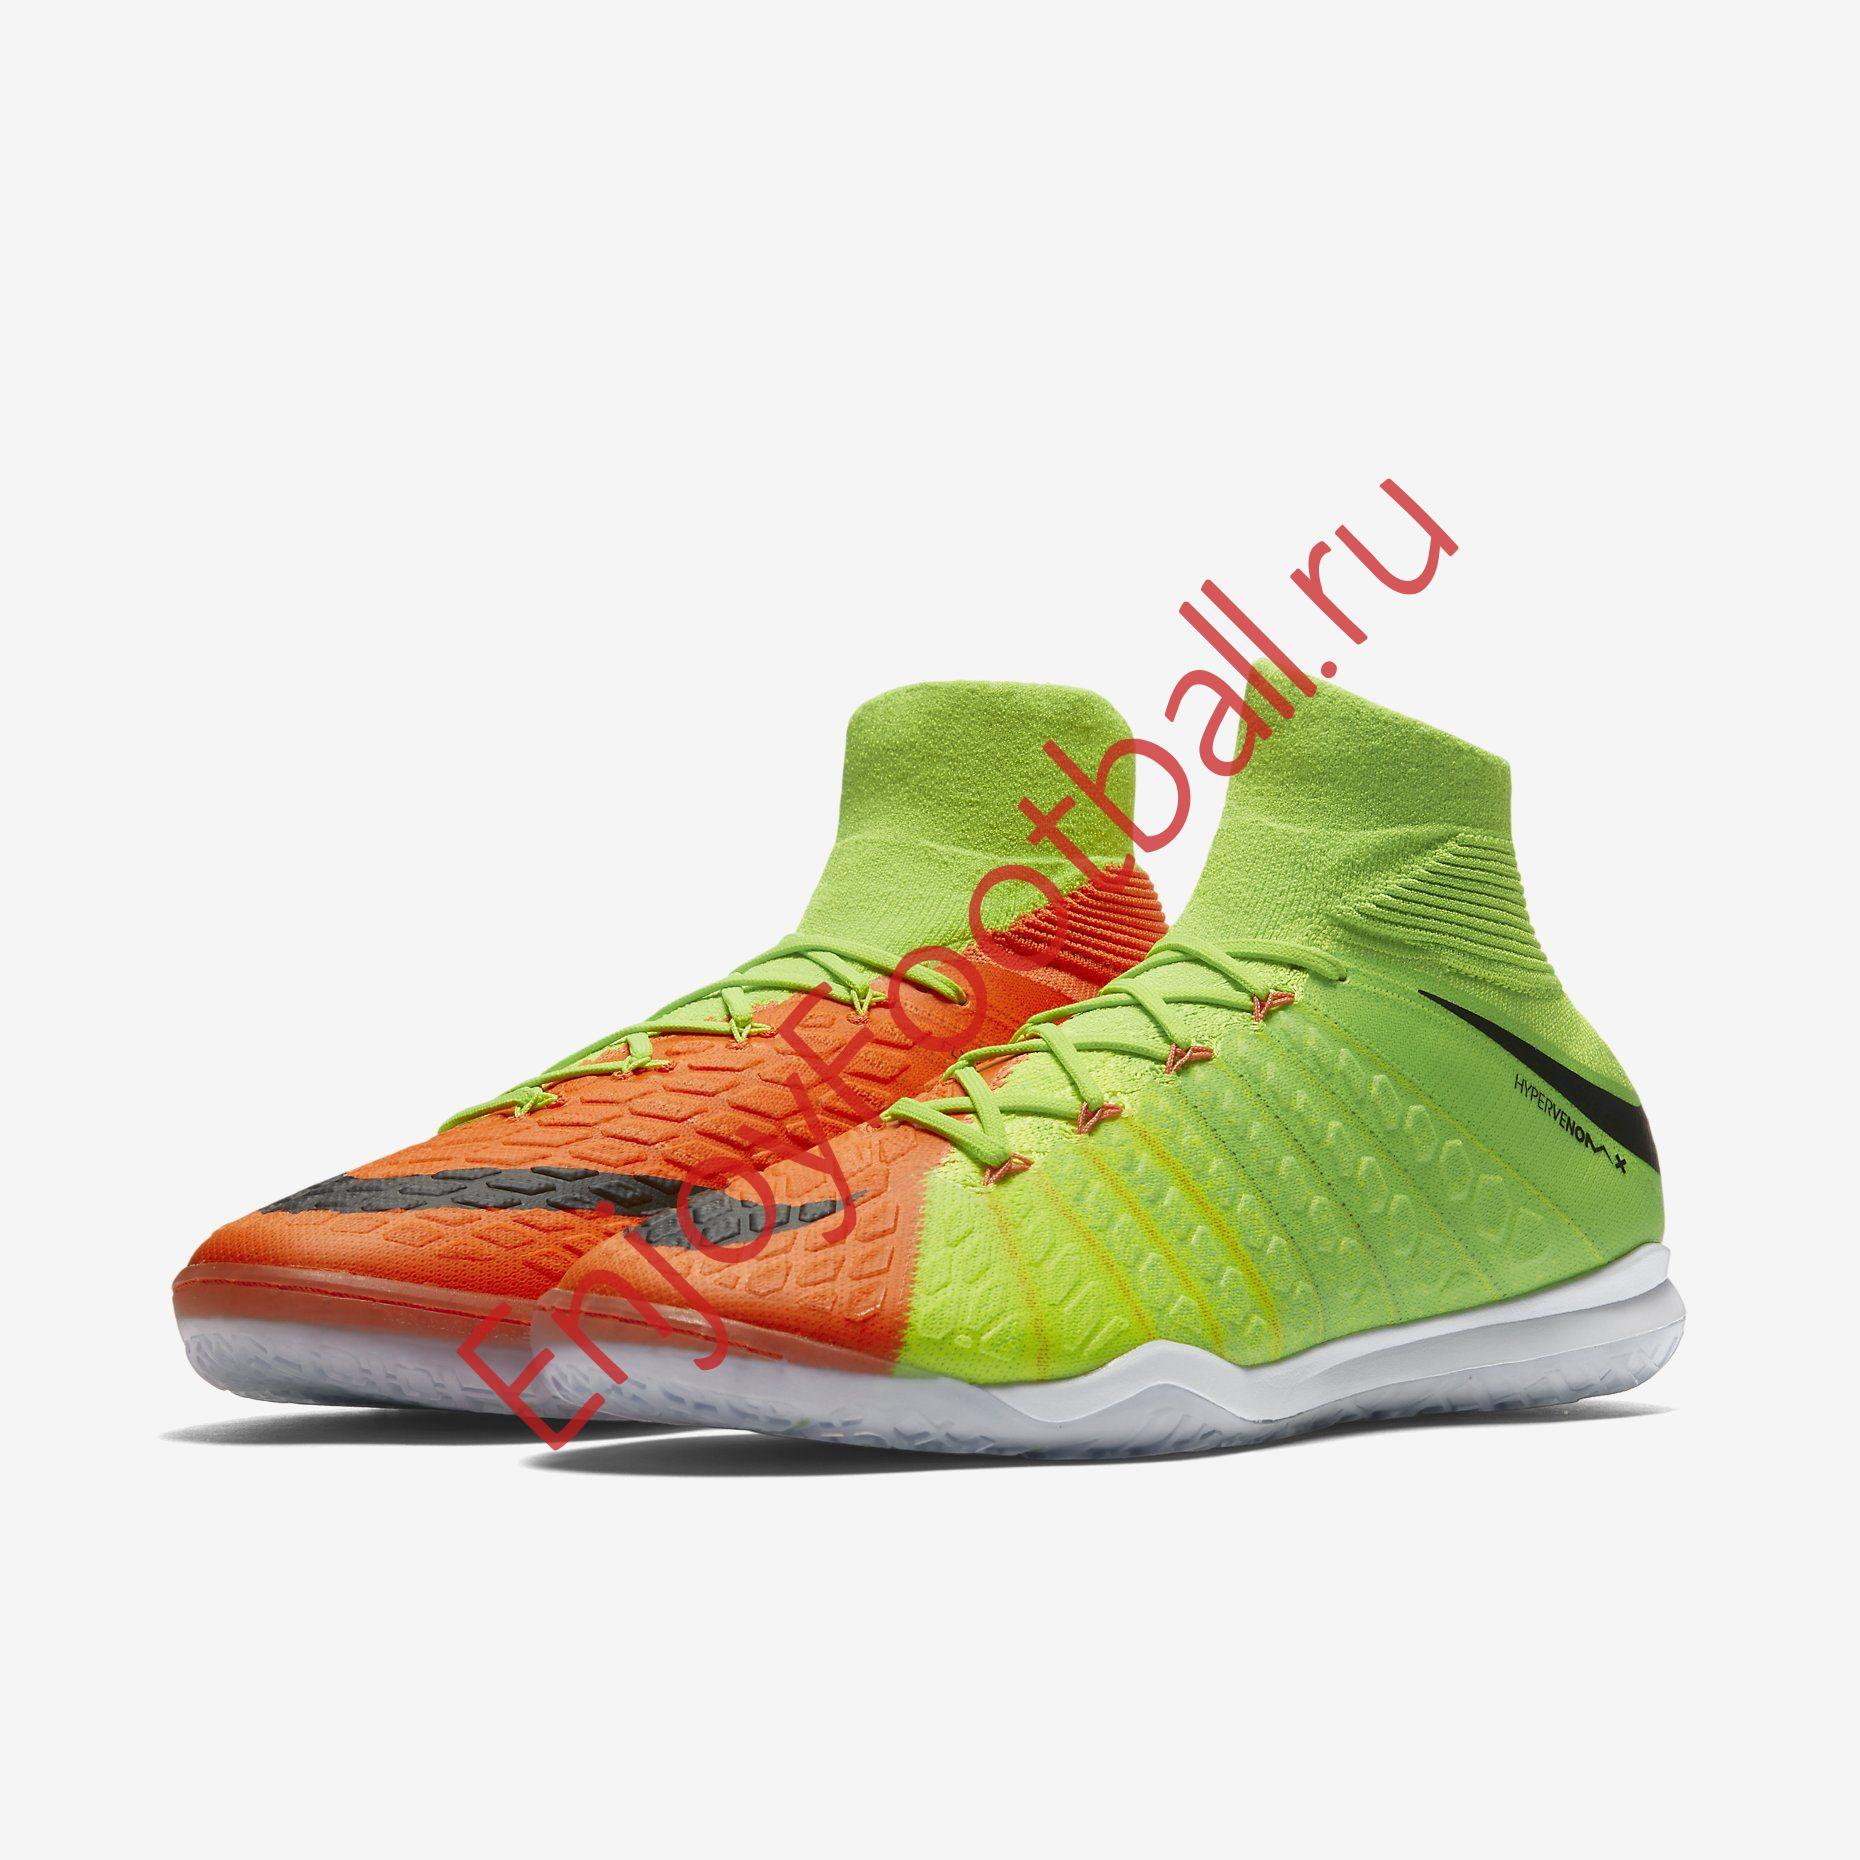 Обувь для зала Nike HypervenomX Proximo II Dynamic Fit IC 852577-308 SR —  купить  Nike Hypervenom ... 0eb0053583d